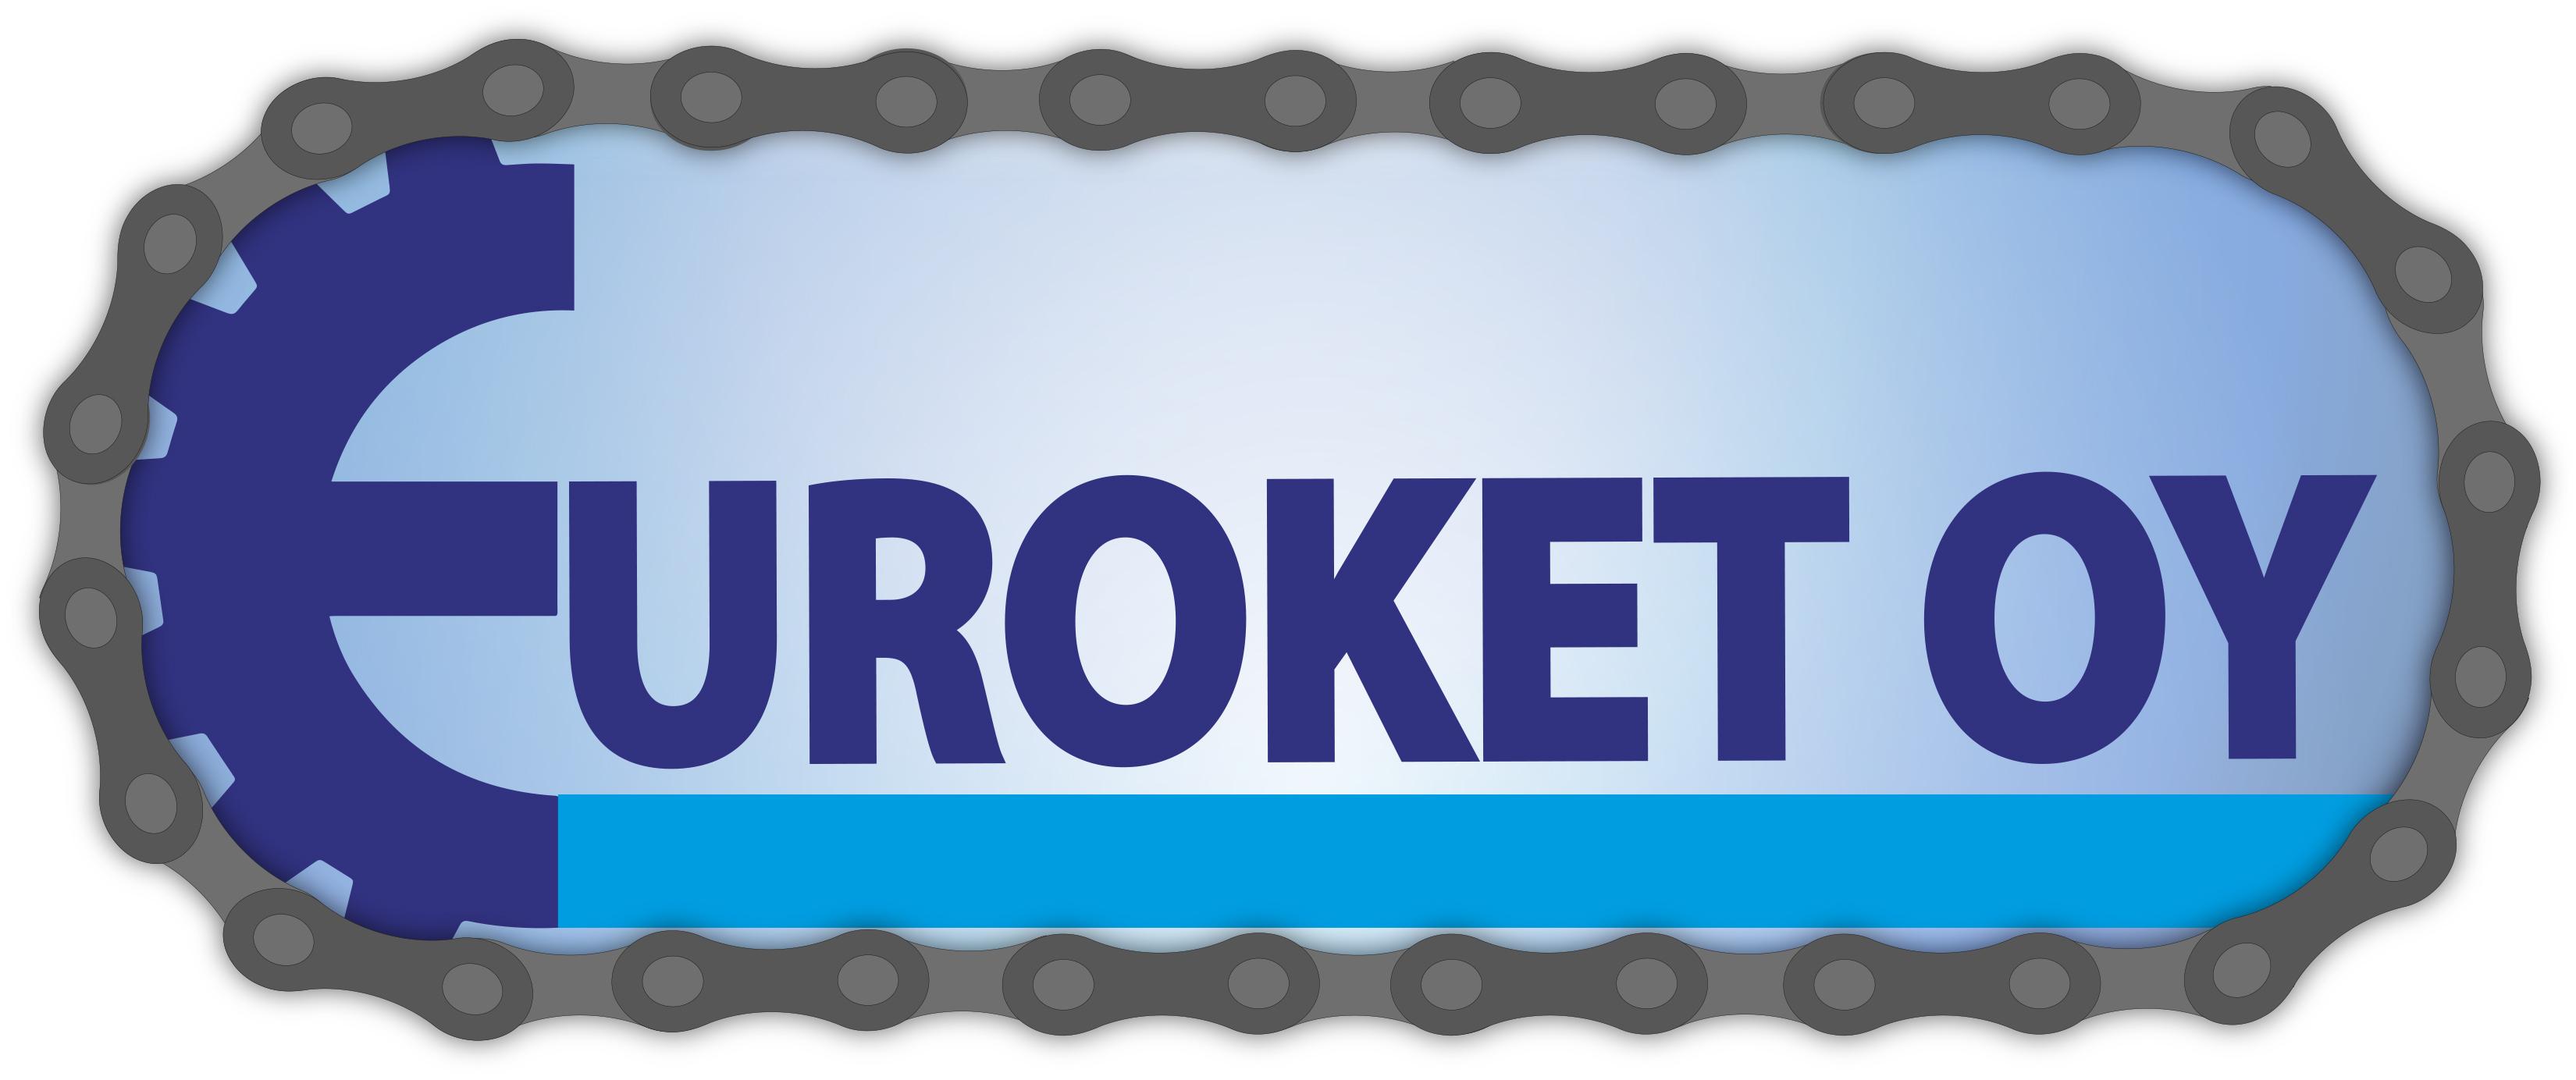 Euroket Oy logo